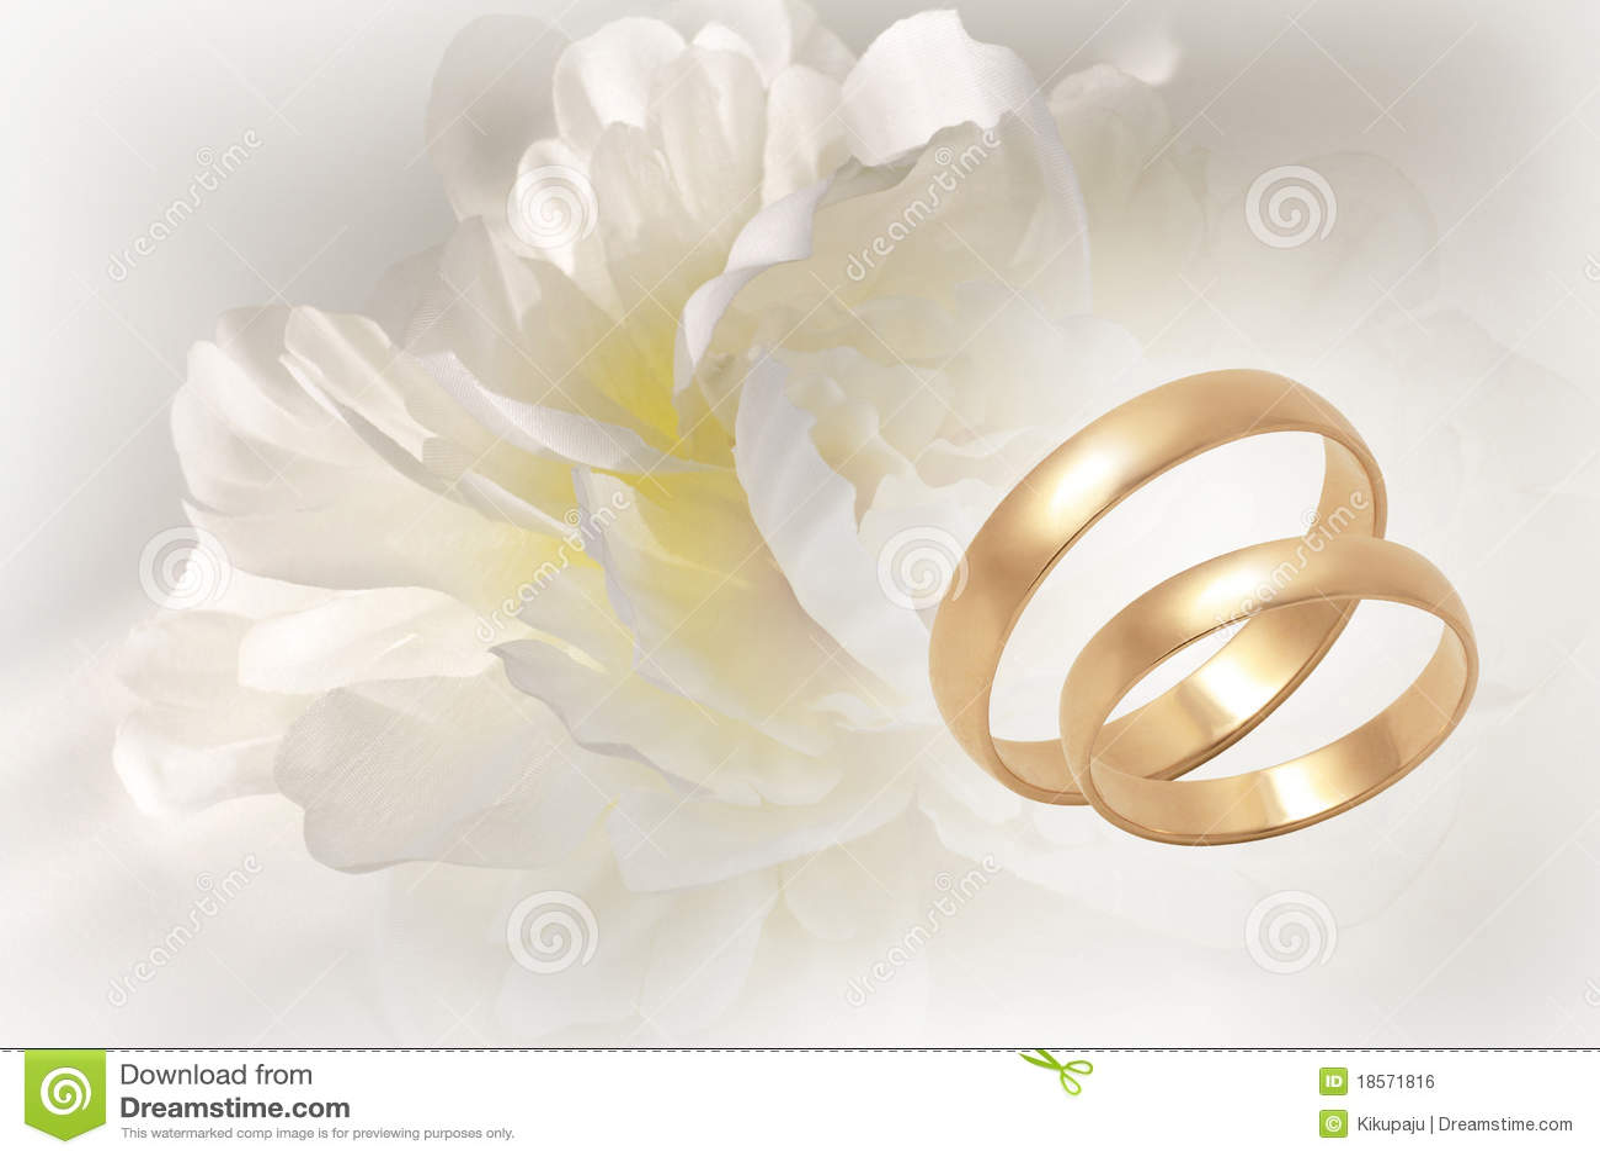 gold wedding rings on flowery festive background stock